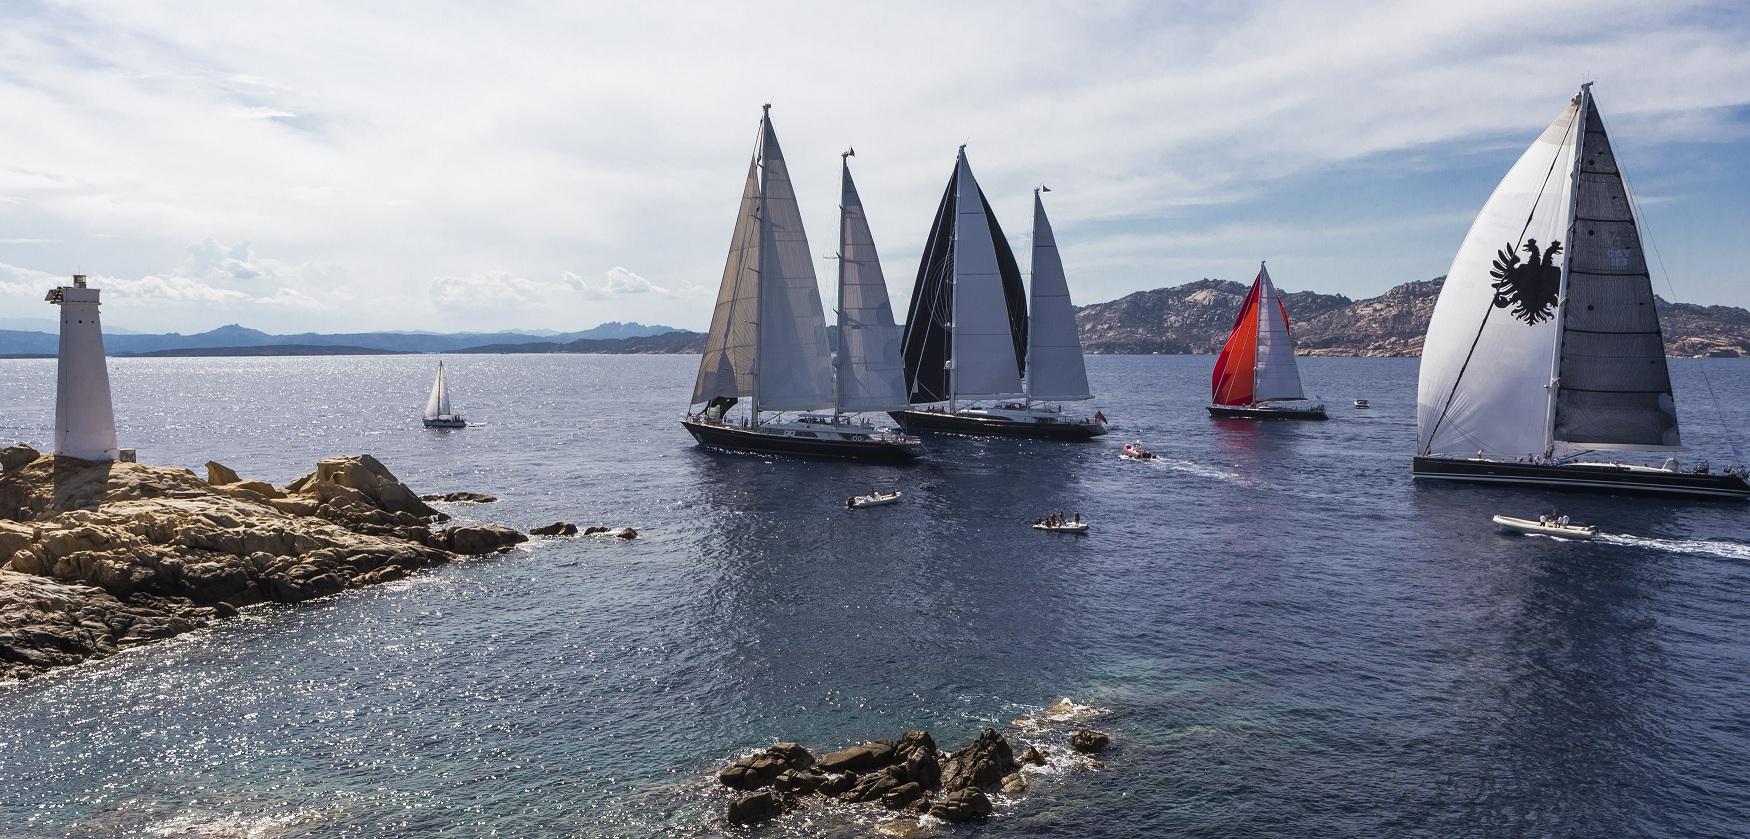 PERINI NAVI PRESENTS THE SIXTH EDITION OF THE PERINI NAVI CUP - NEWS - Yacht Club Costa Smeralda